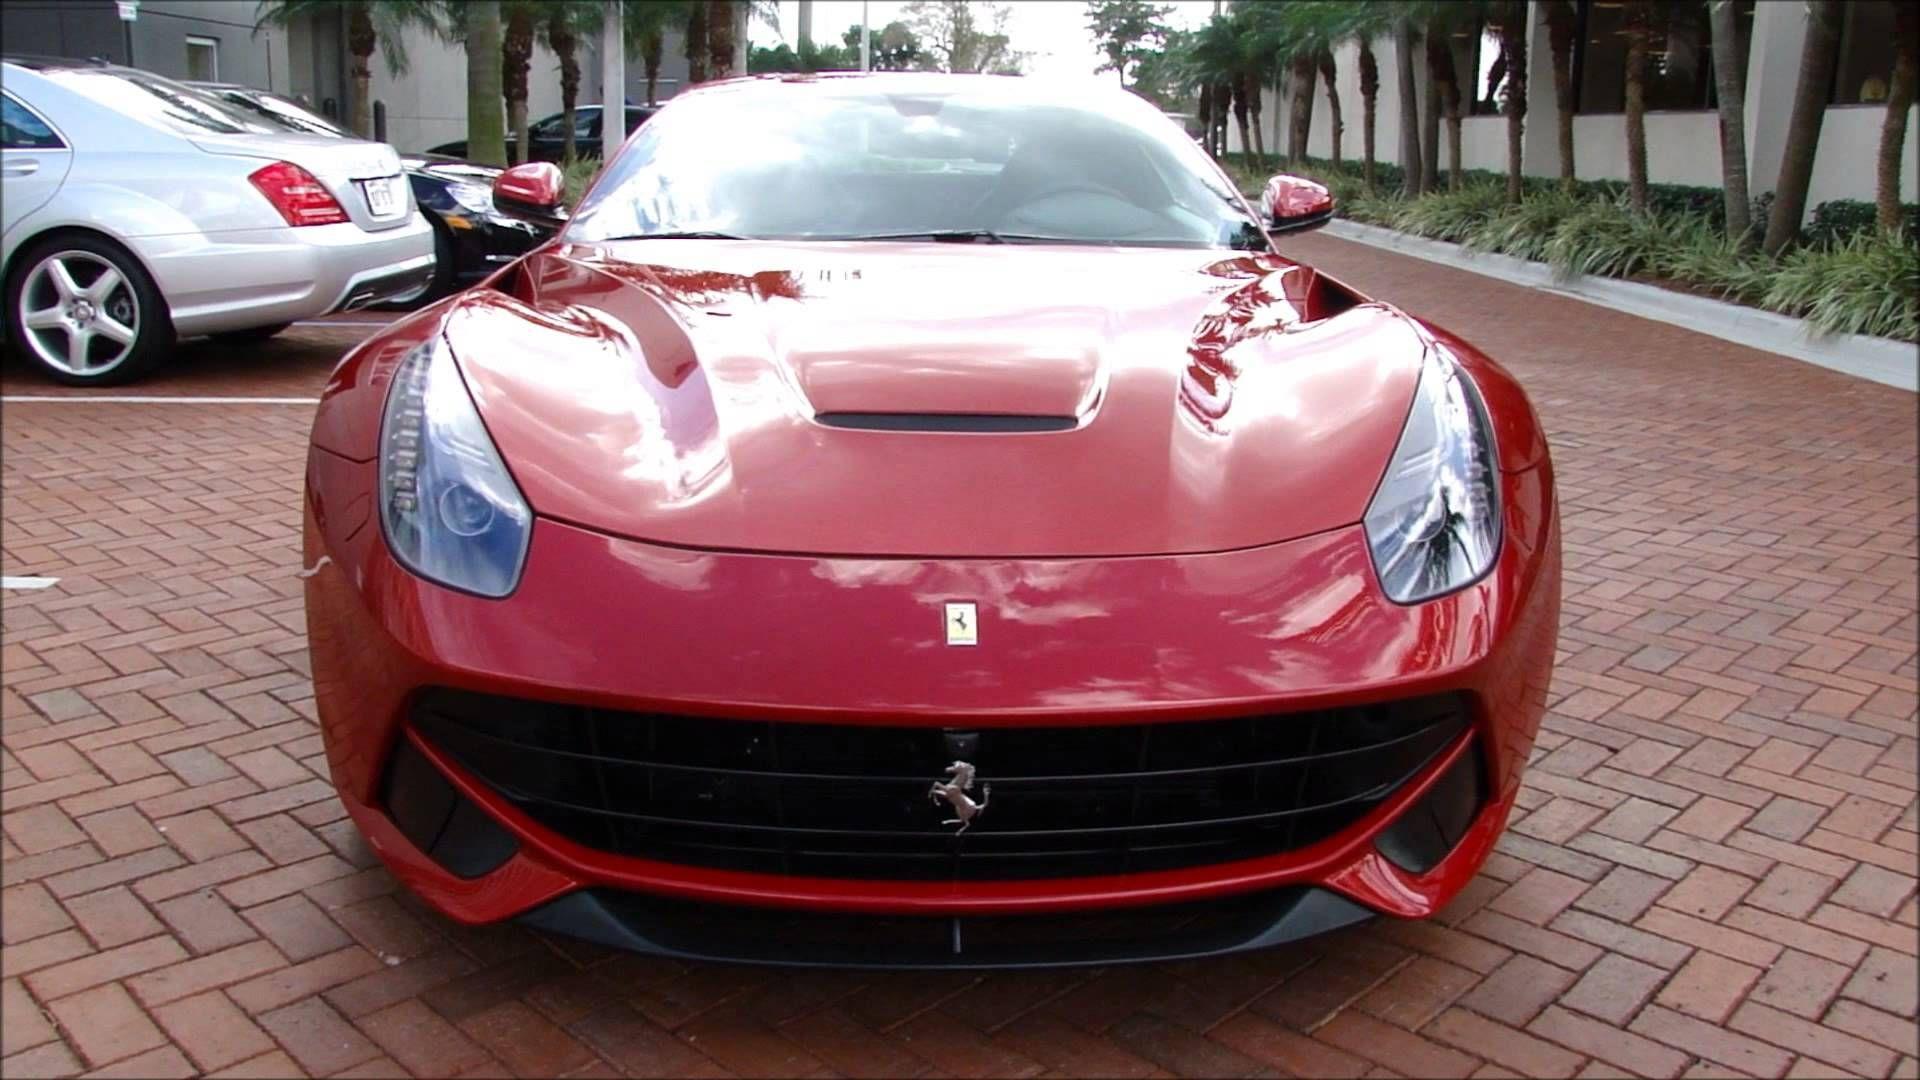 Ferrari F12 Berlinetta rev, drive \u0026 interior